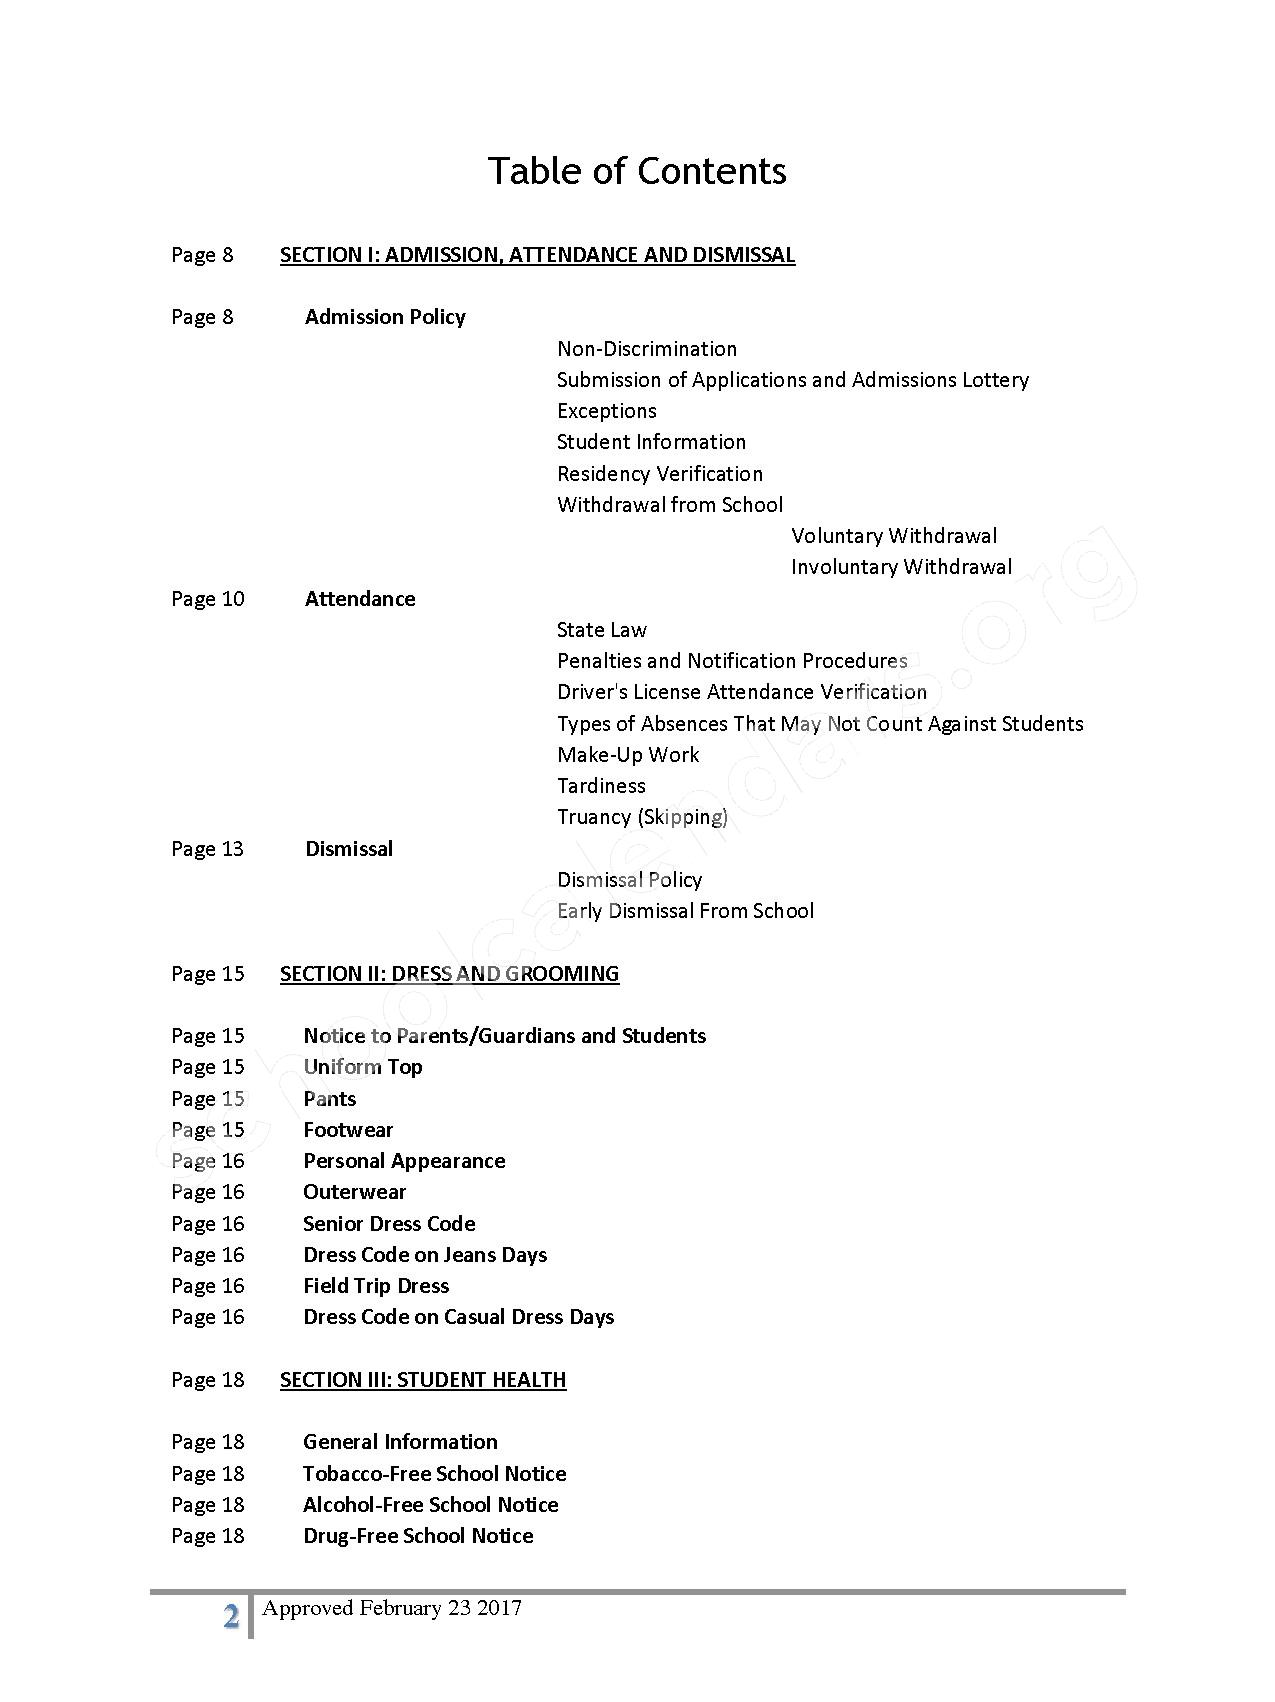 2016 - 2017 District Calendar – Lisa Academy Public Charter Schools – page 2